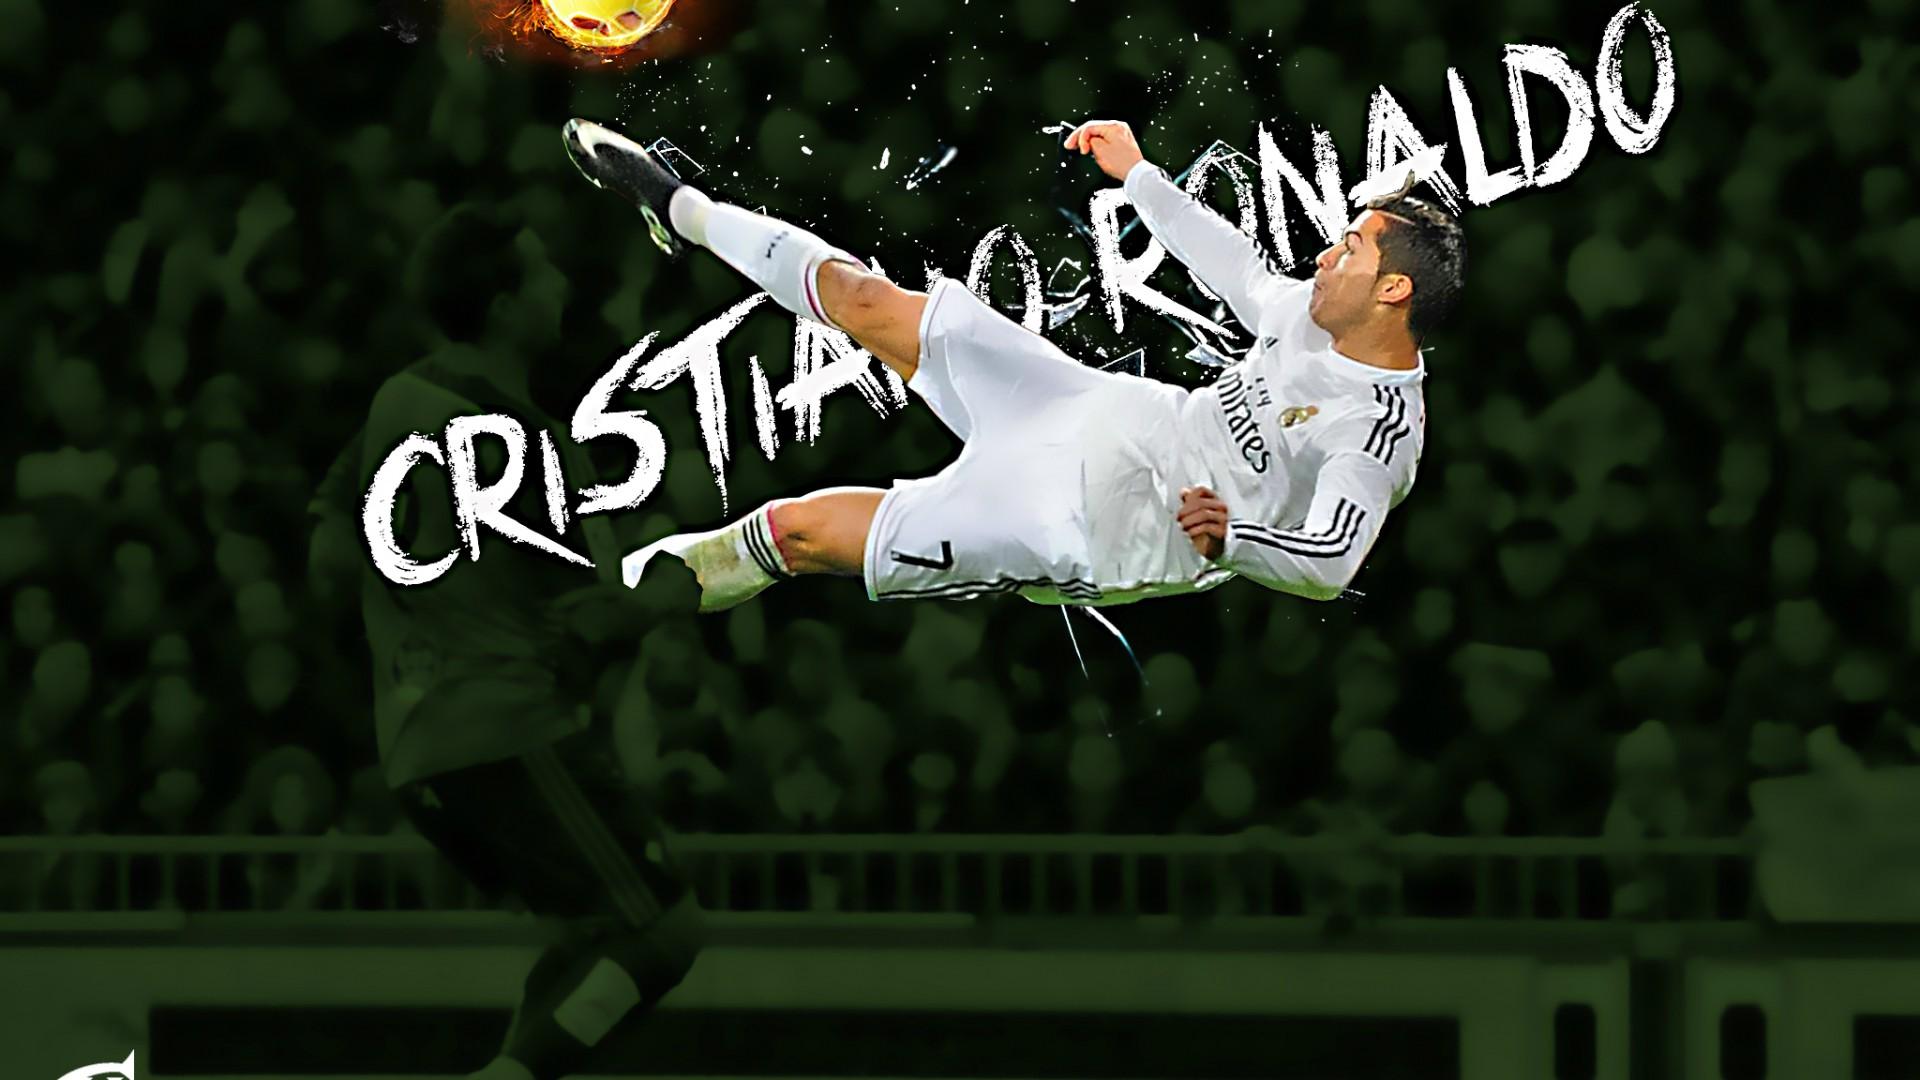 Ronaldo CR7 Flying Shot Football HD Wallpaper Search more high 1920x1080